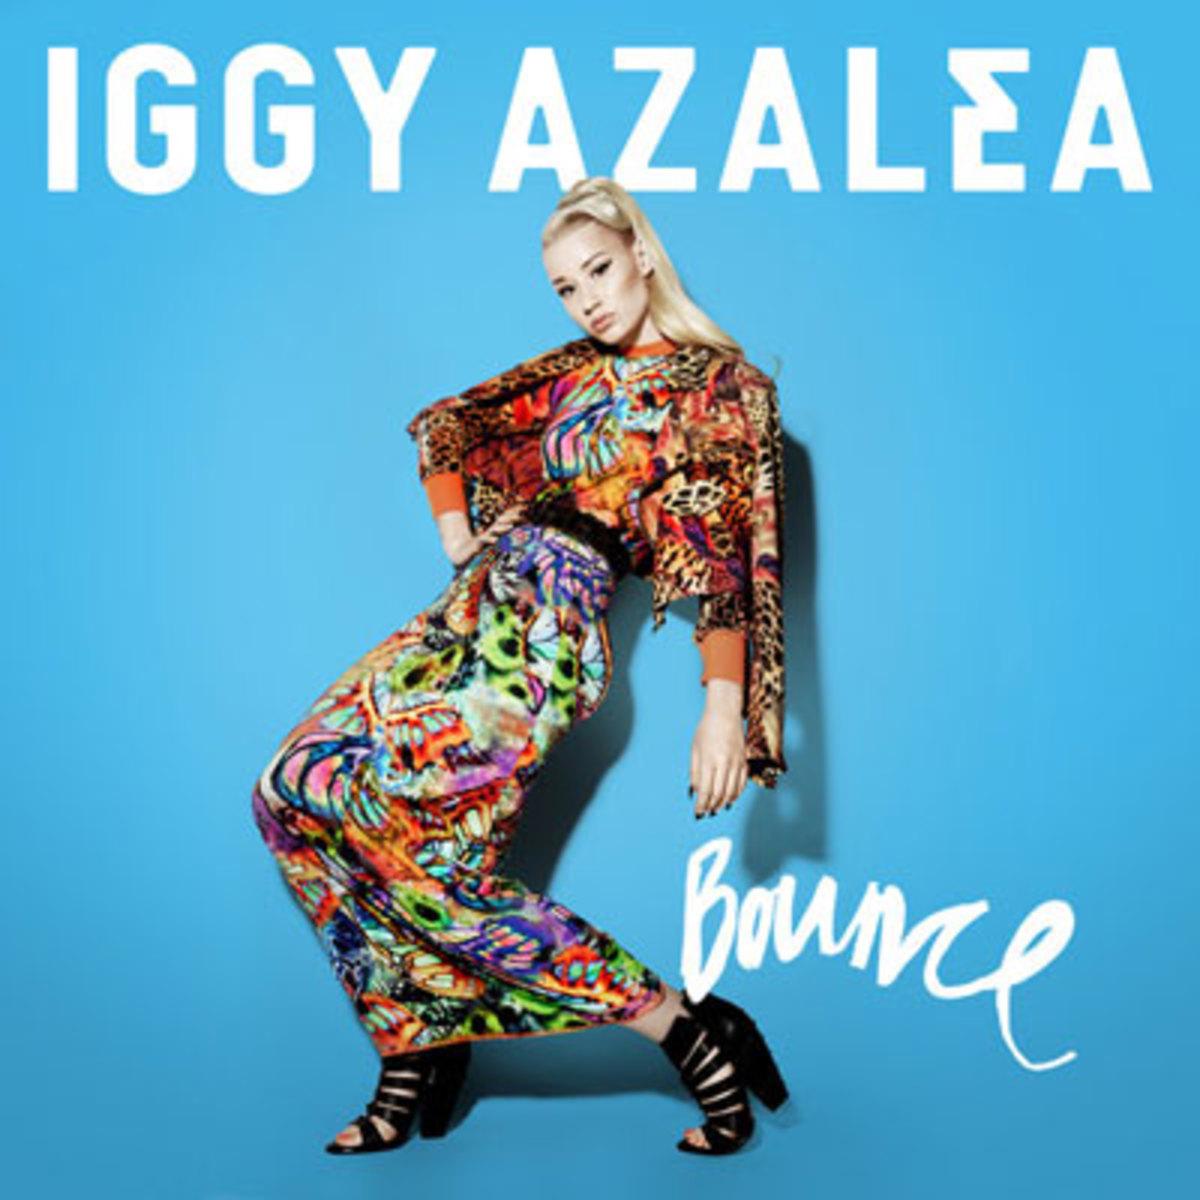 iggyazalea-bounce2.jpg